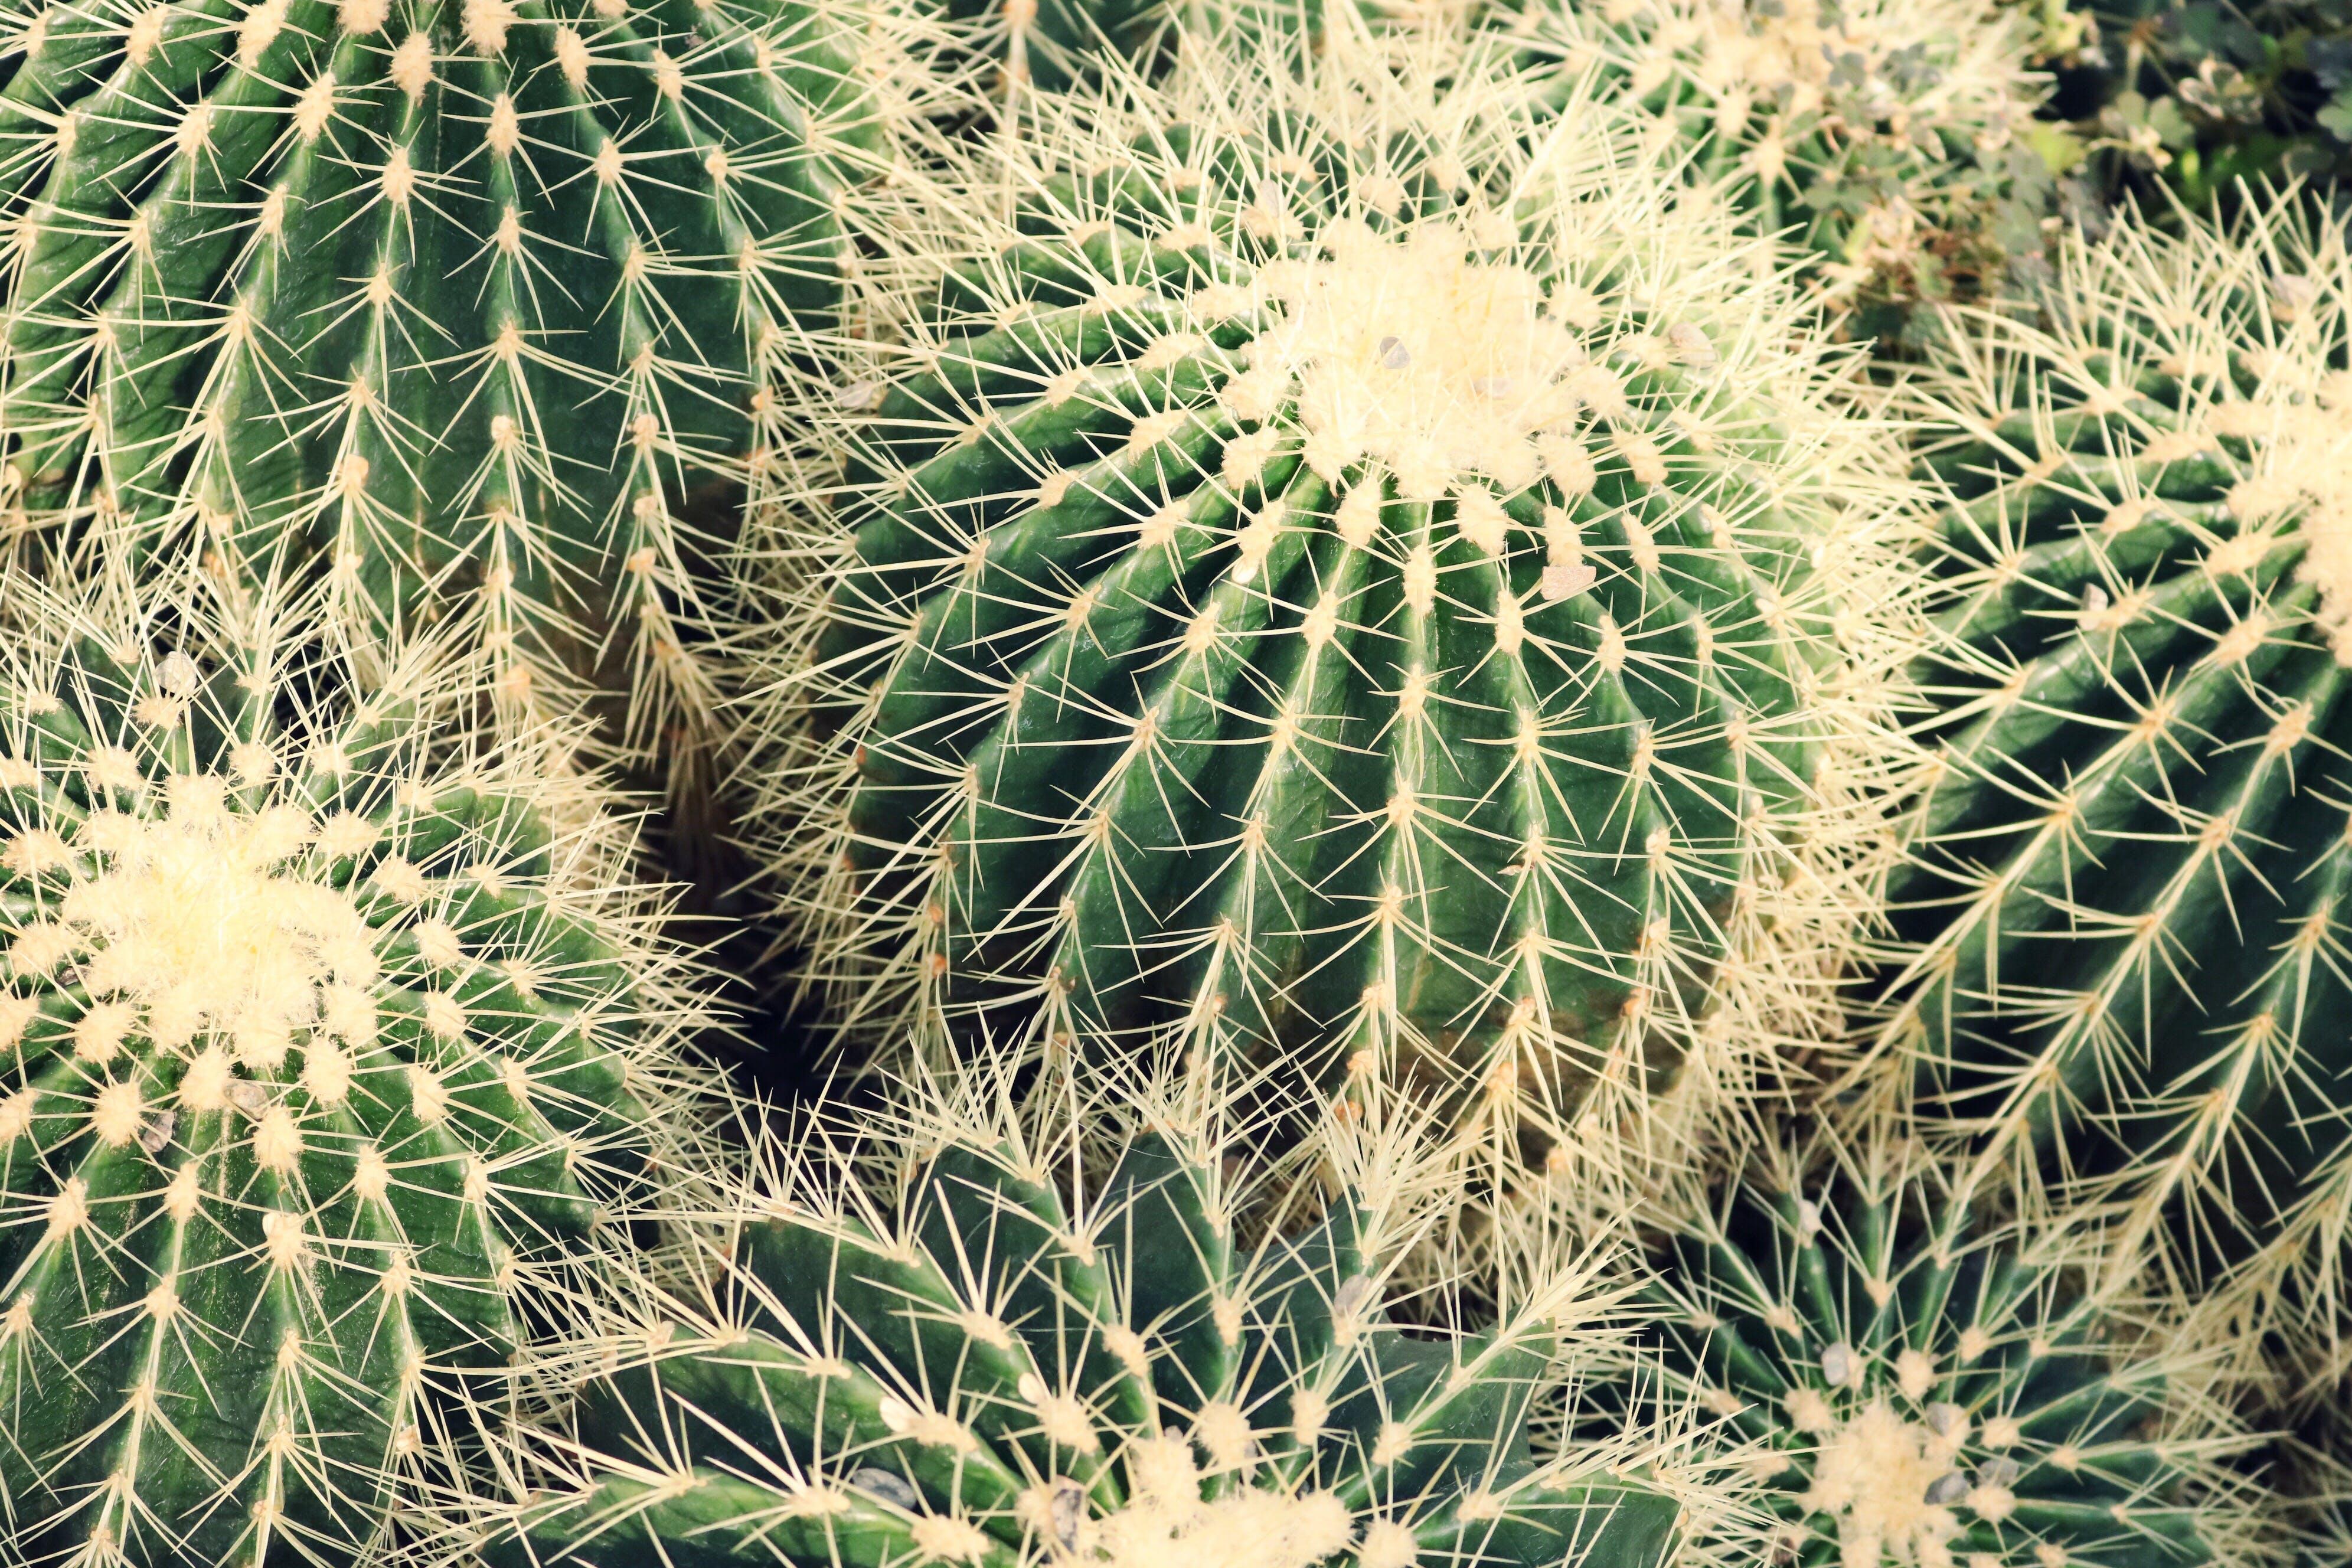 Closeup Photo of Cactus Plants